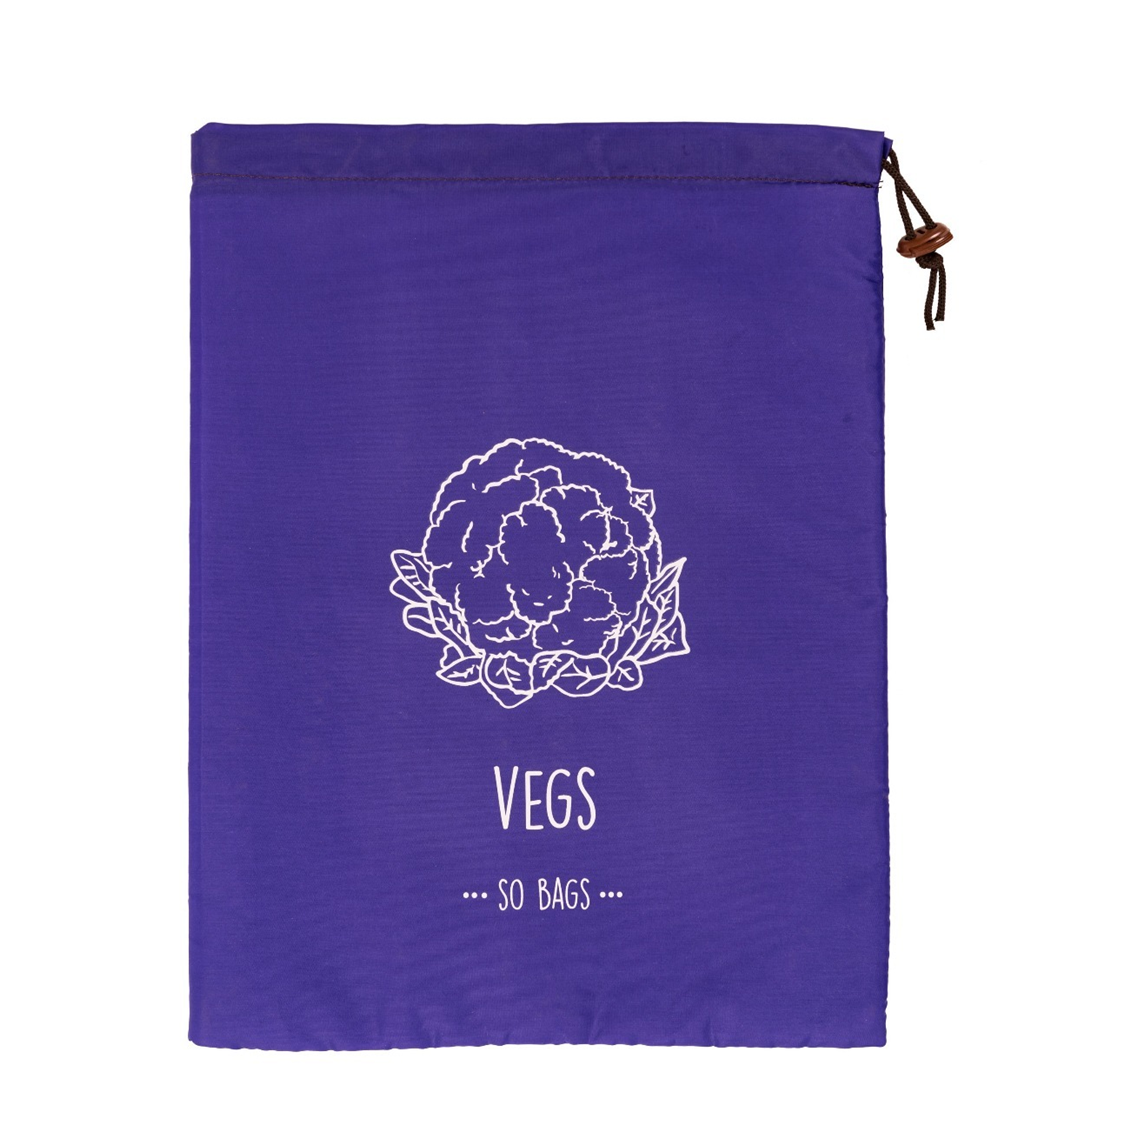 Saco So Bags Vegs